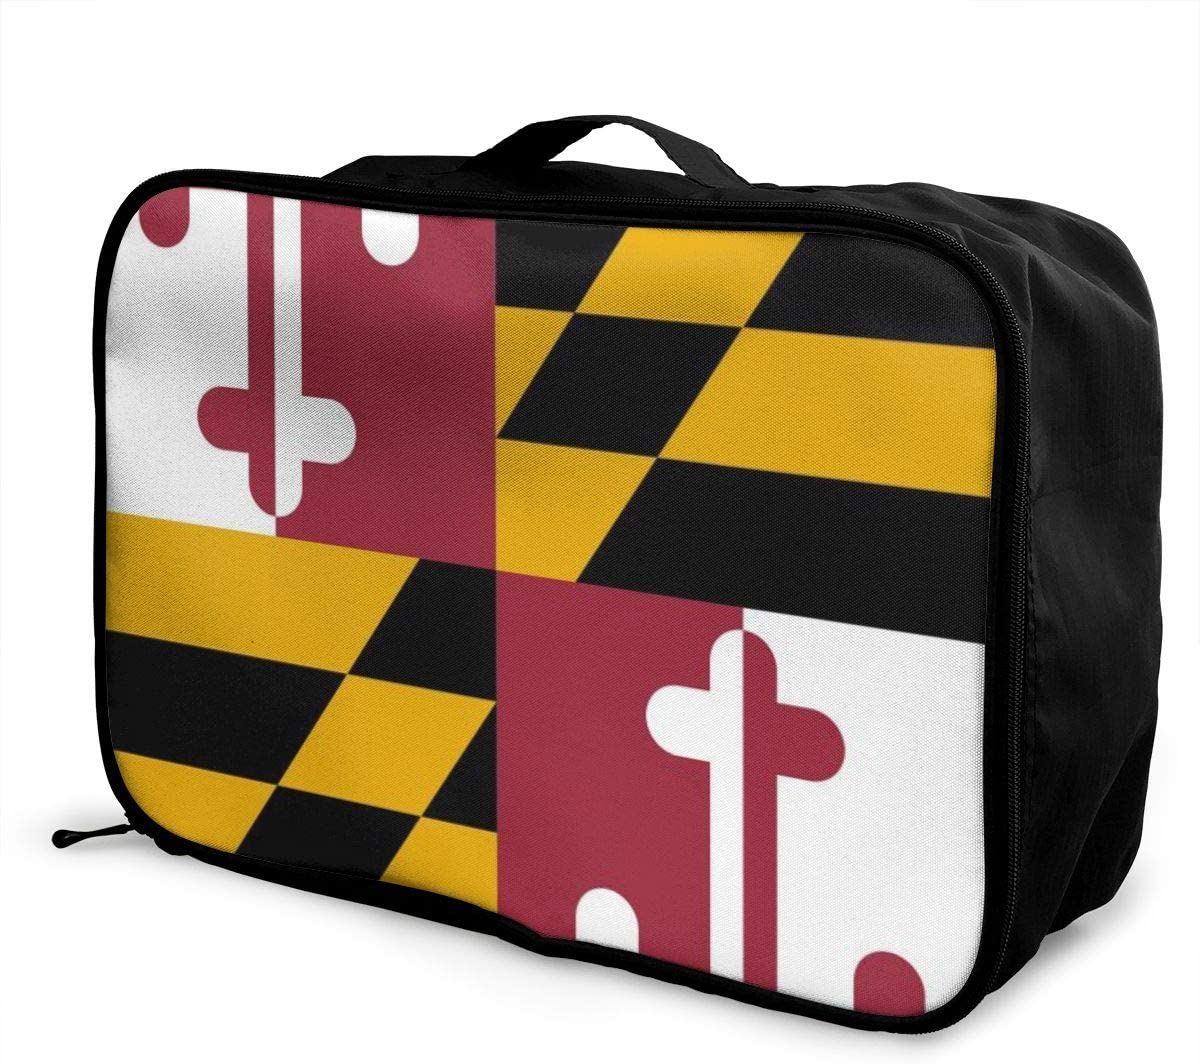 Culora Flag Of Maryland Lightweight Large Capacity Portable Luggage Bag